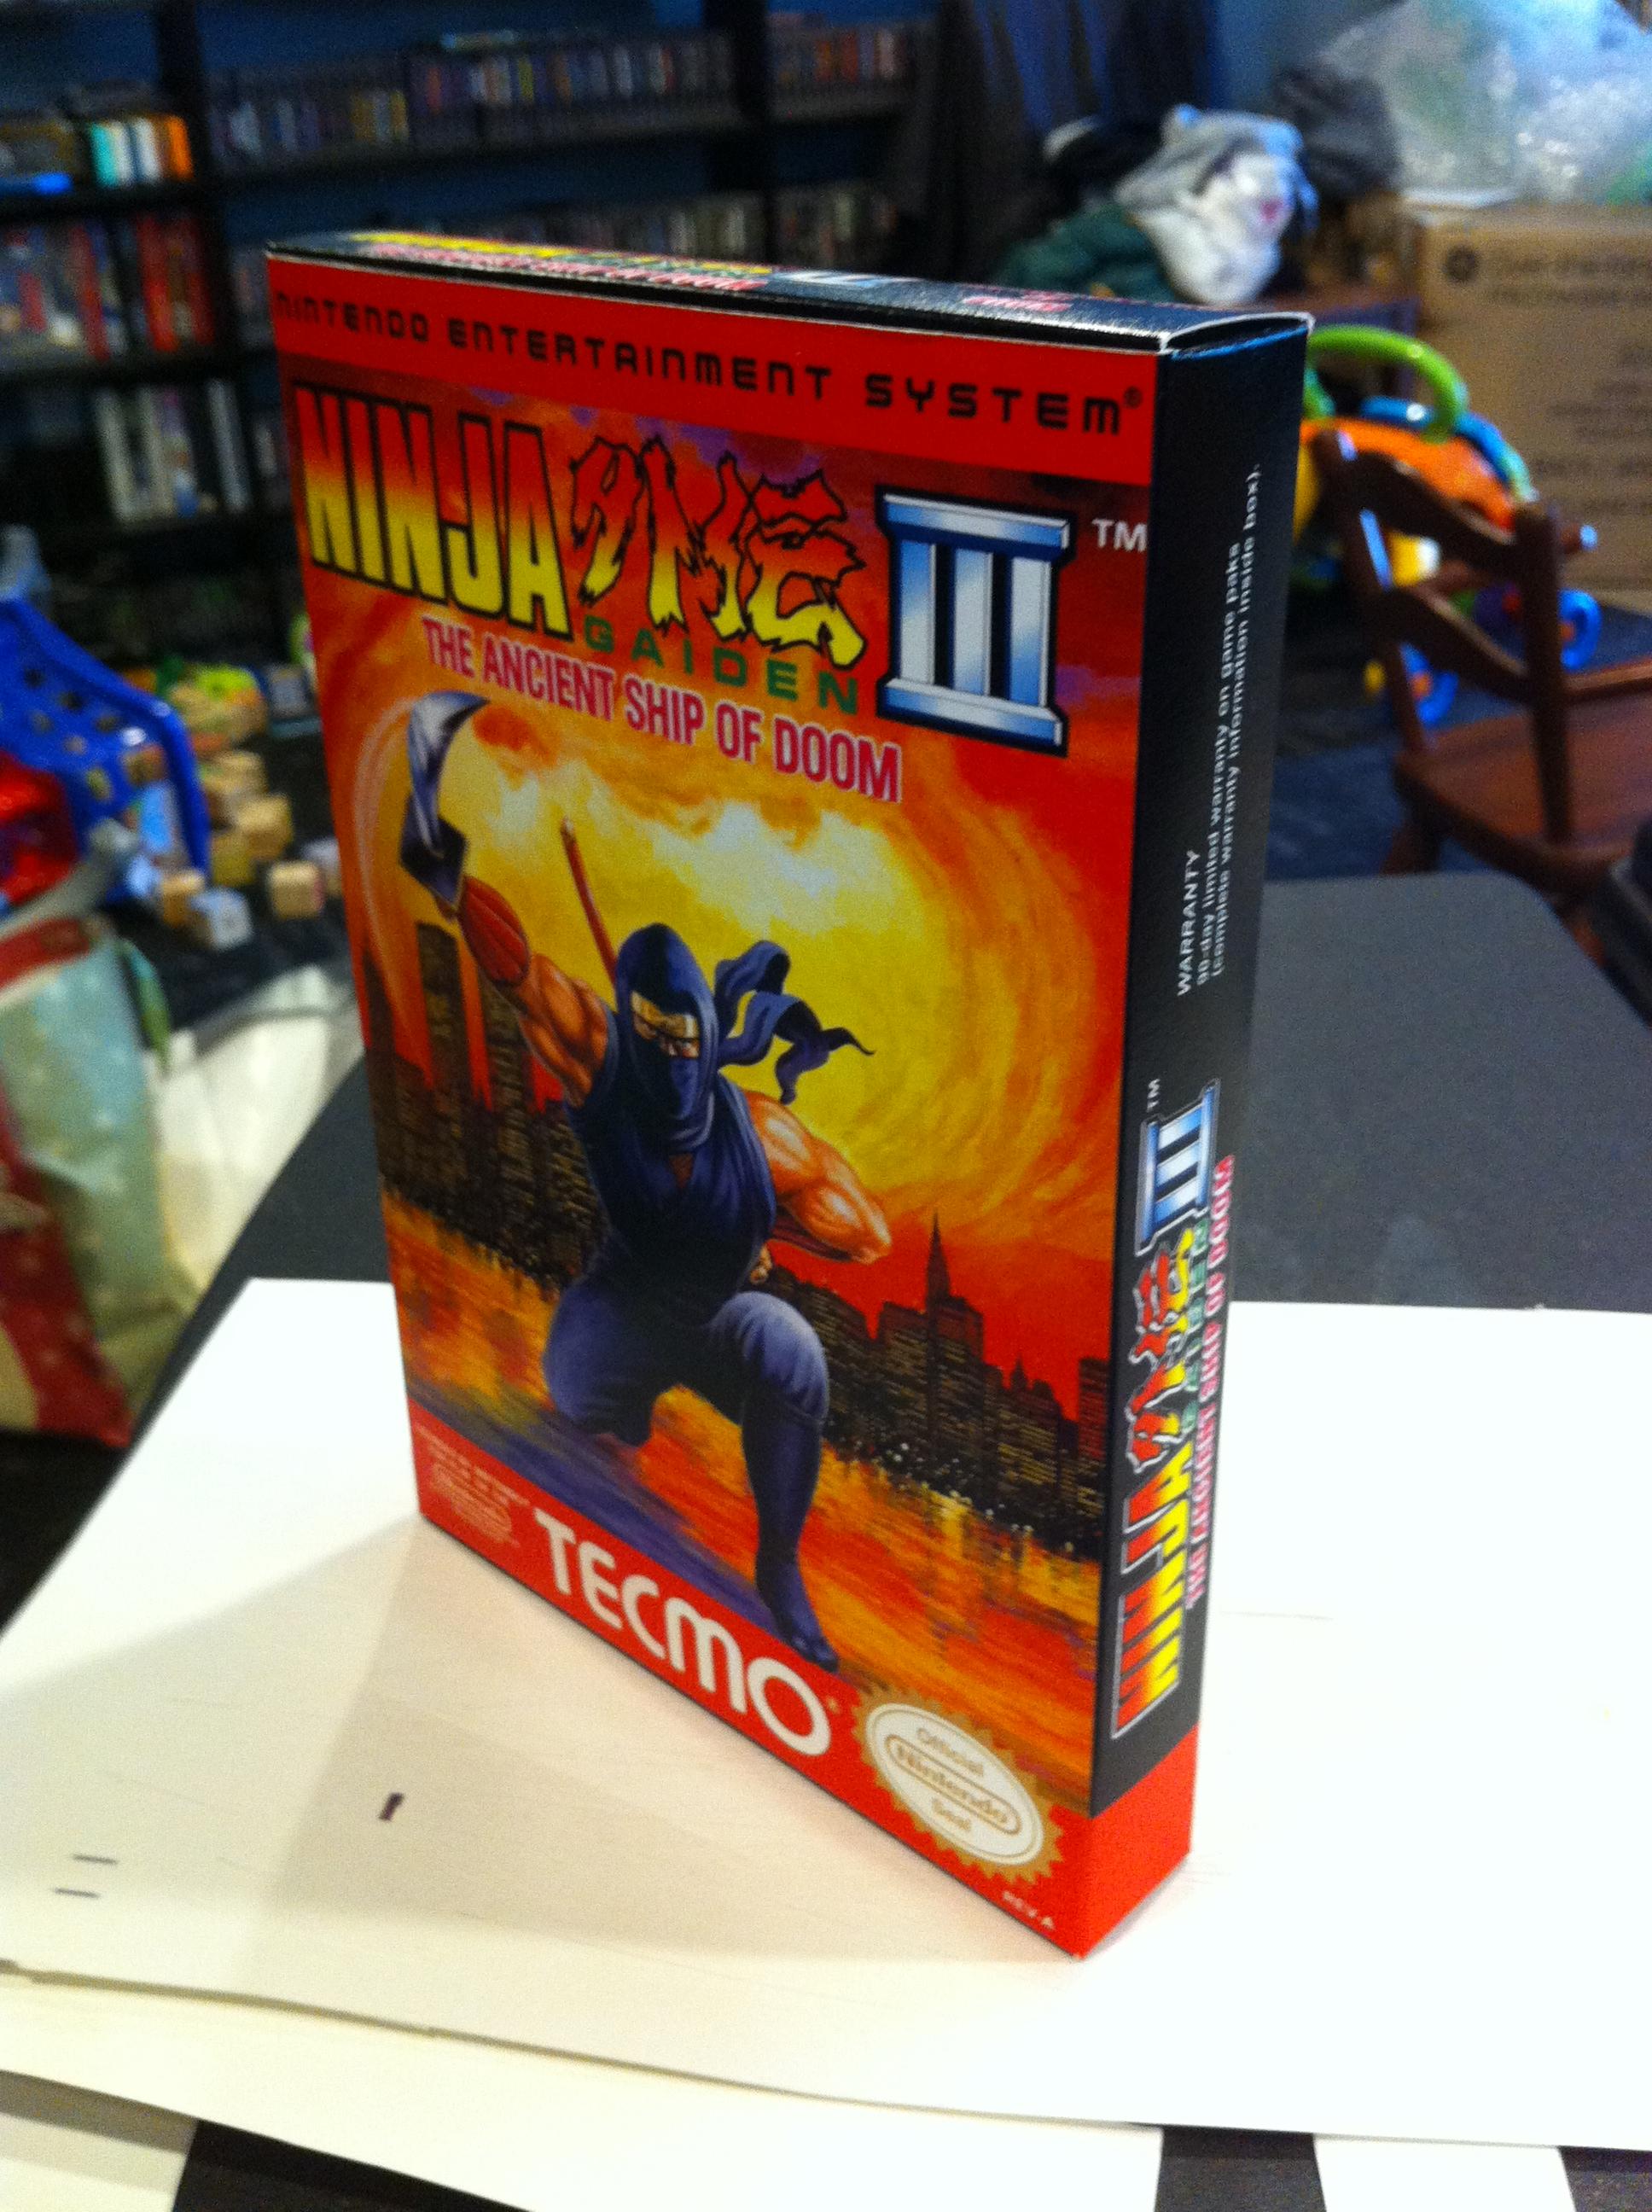 Ninja Gaiden 3 Box My Games Reproduction Game Boxes